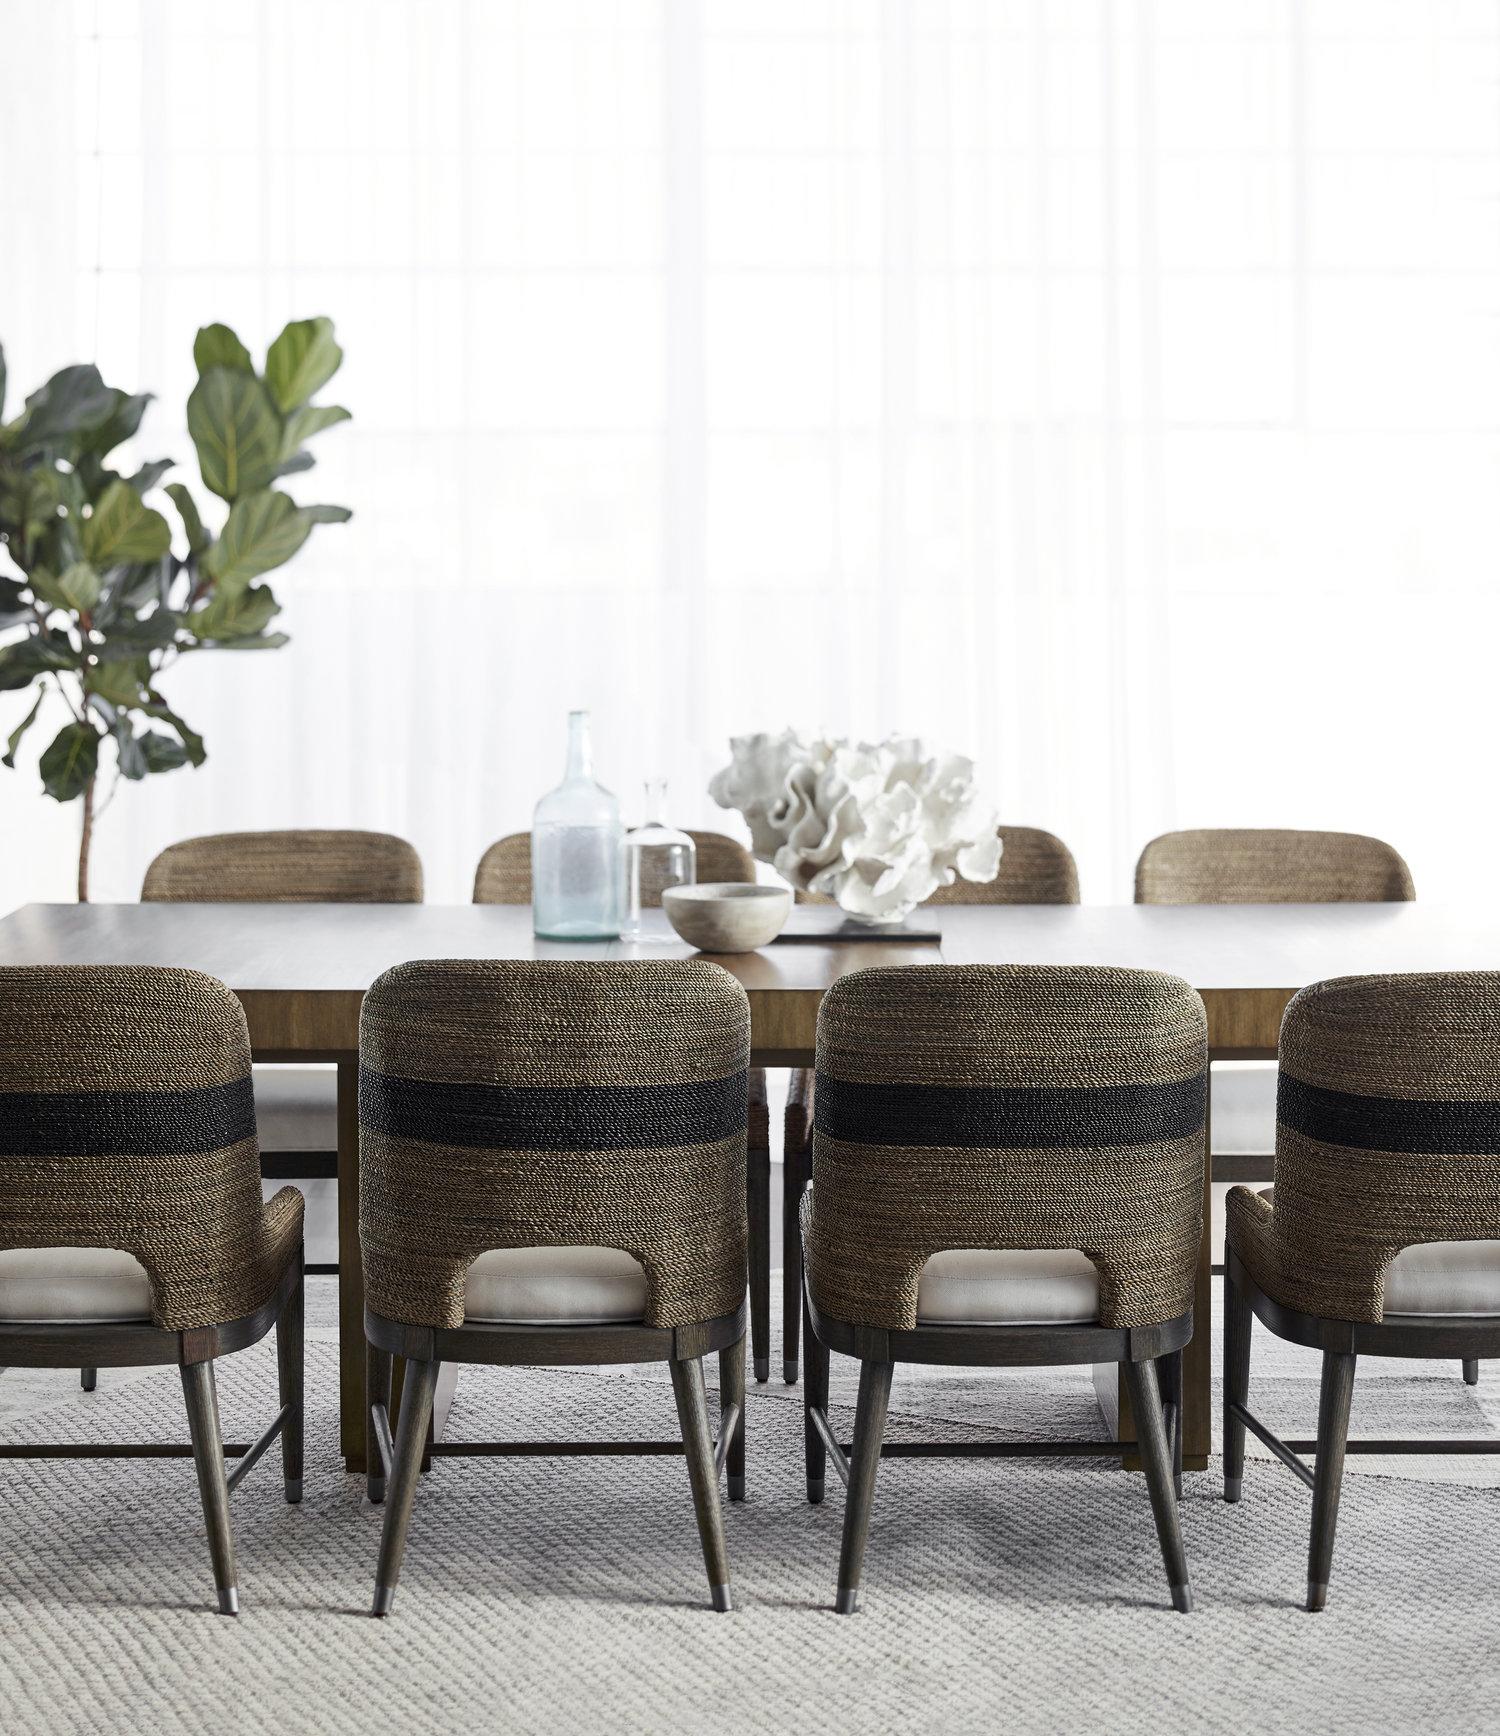 Rosen Hospitality Group Palecek Hospitality